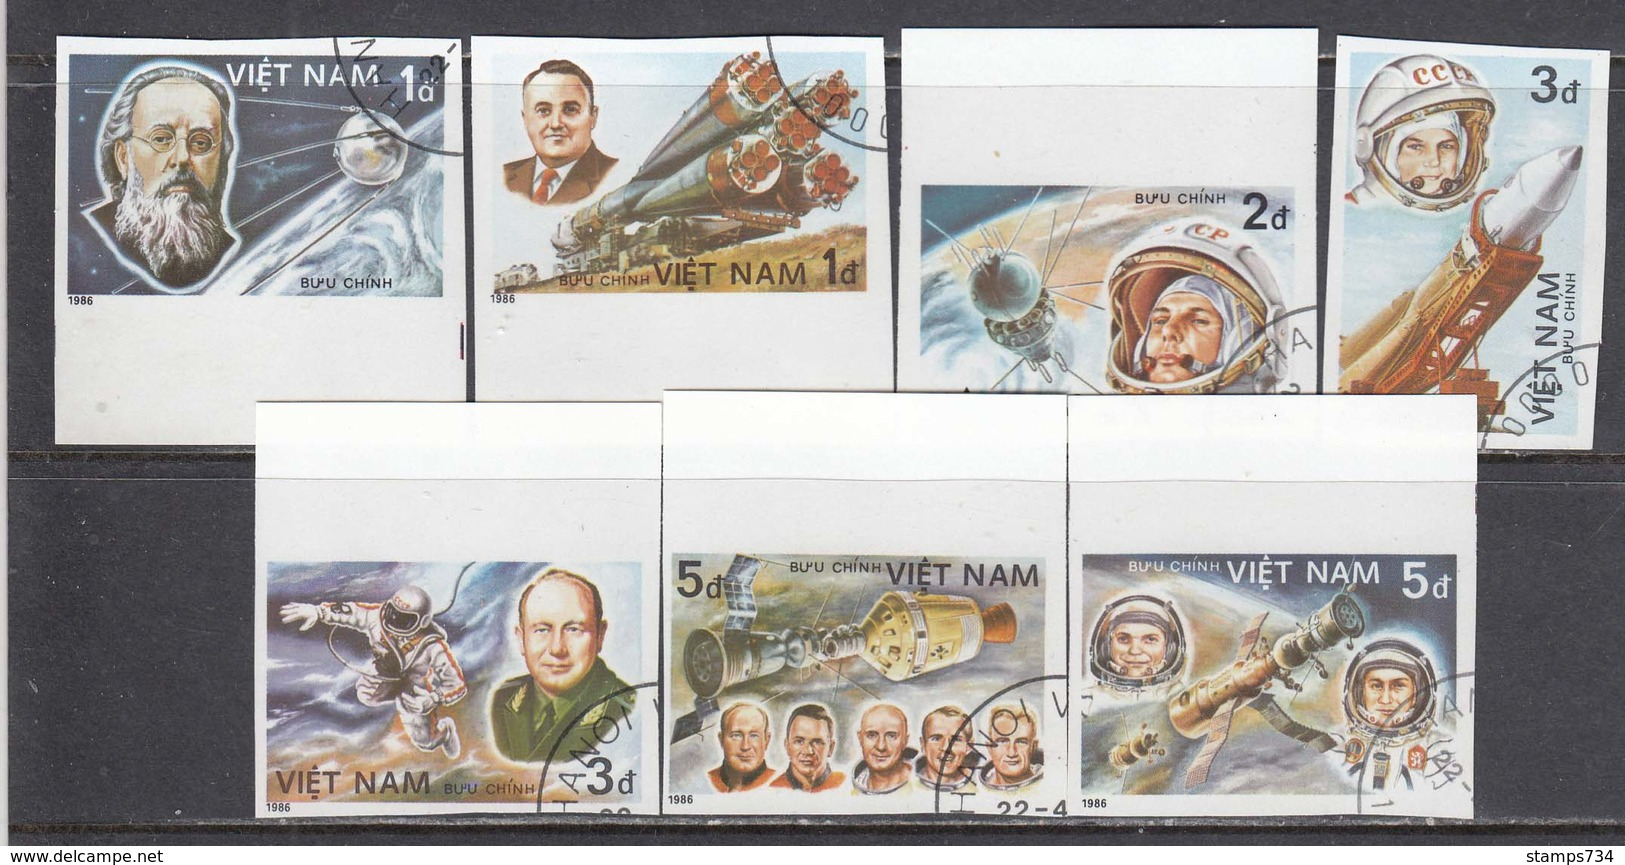 Vietnam 1986 - Space, Imperforated, Canceled - Vietnam